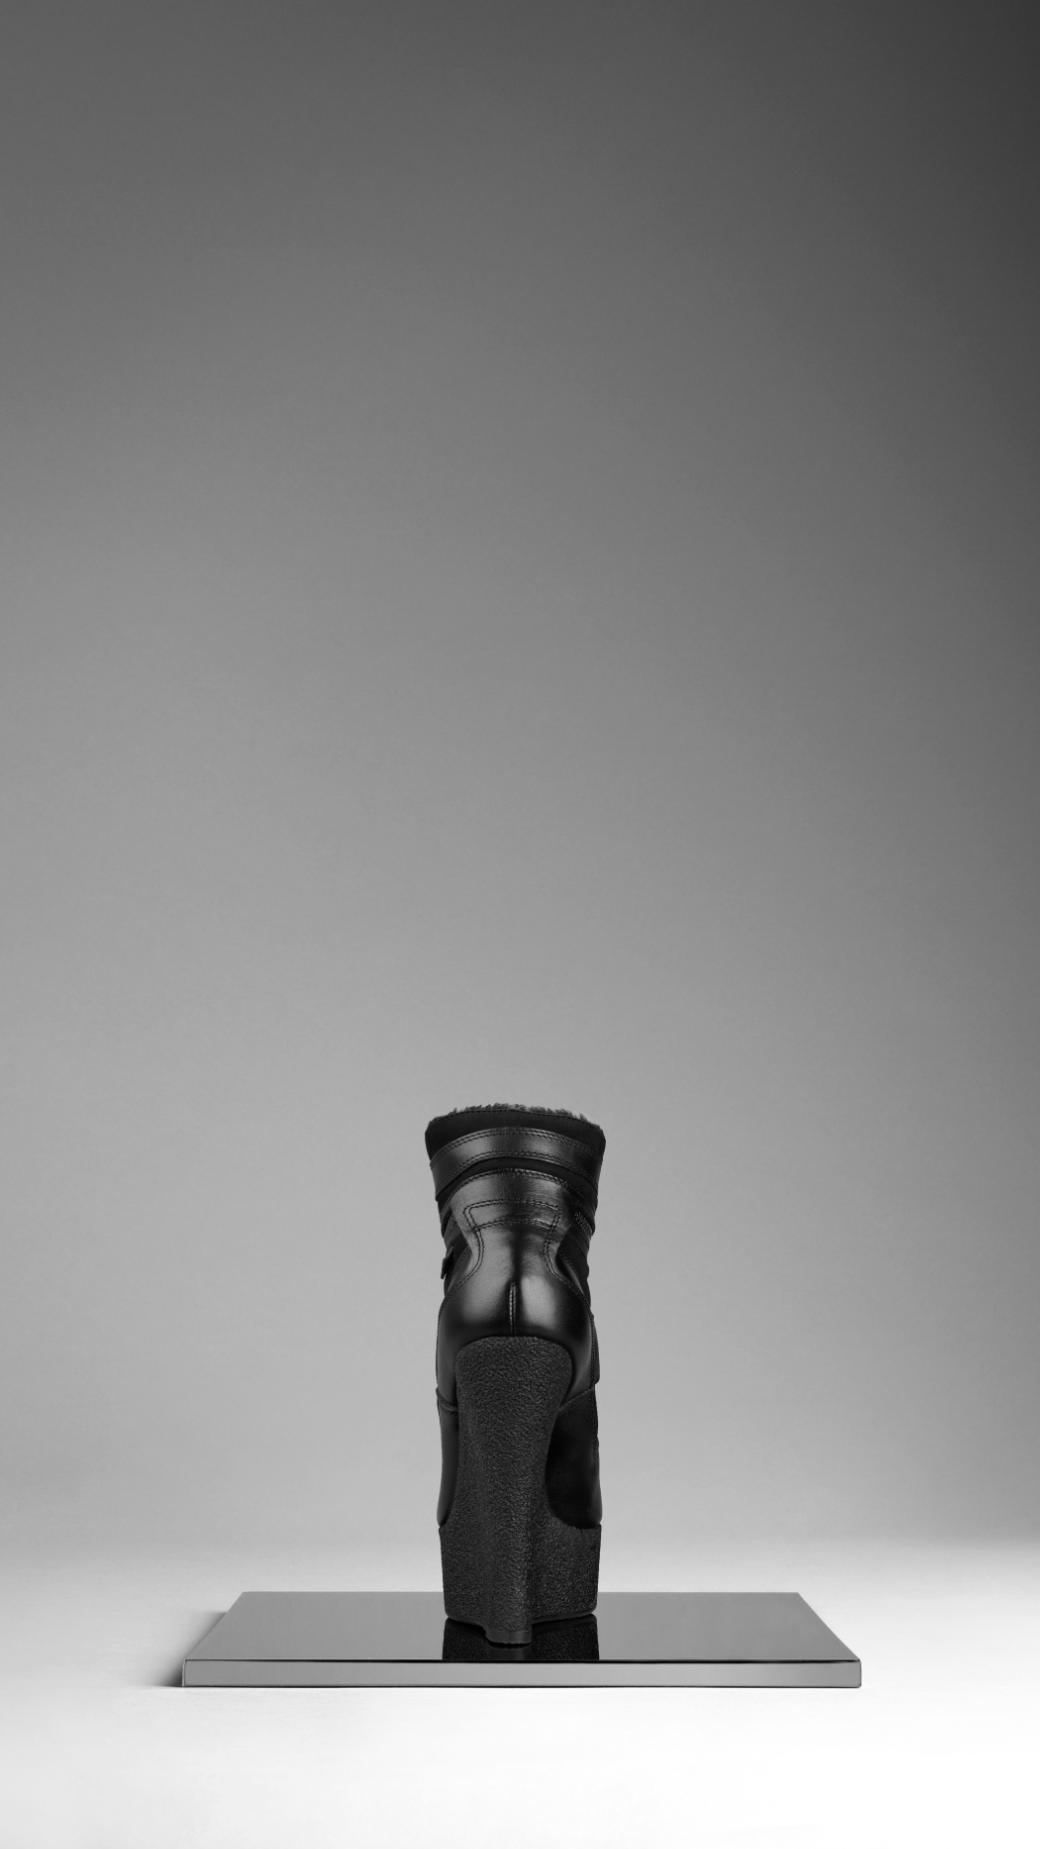 Burberry Suede Platform Wedge Trainers in Black